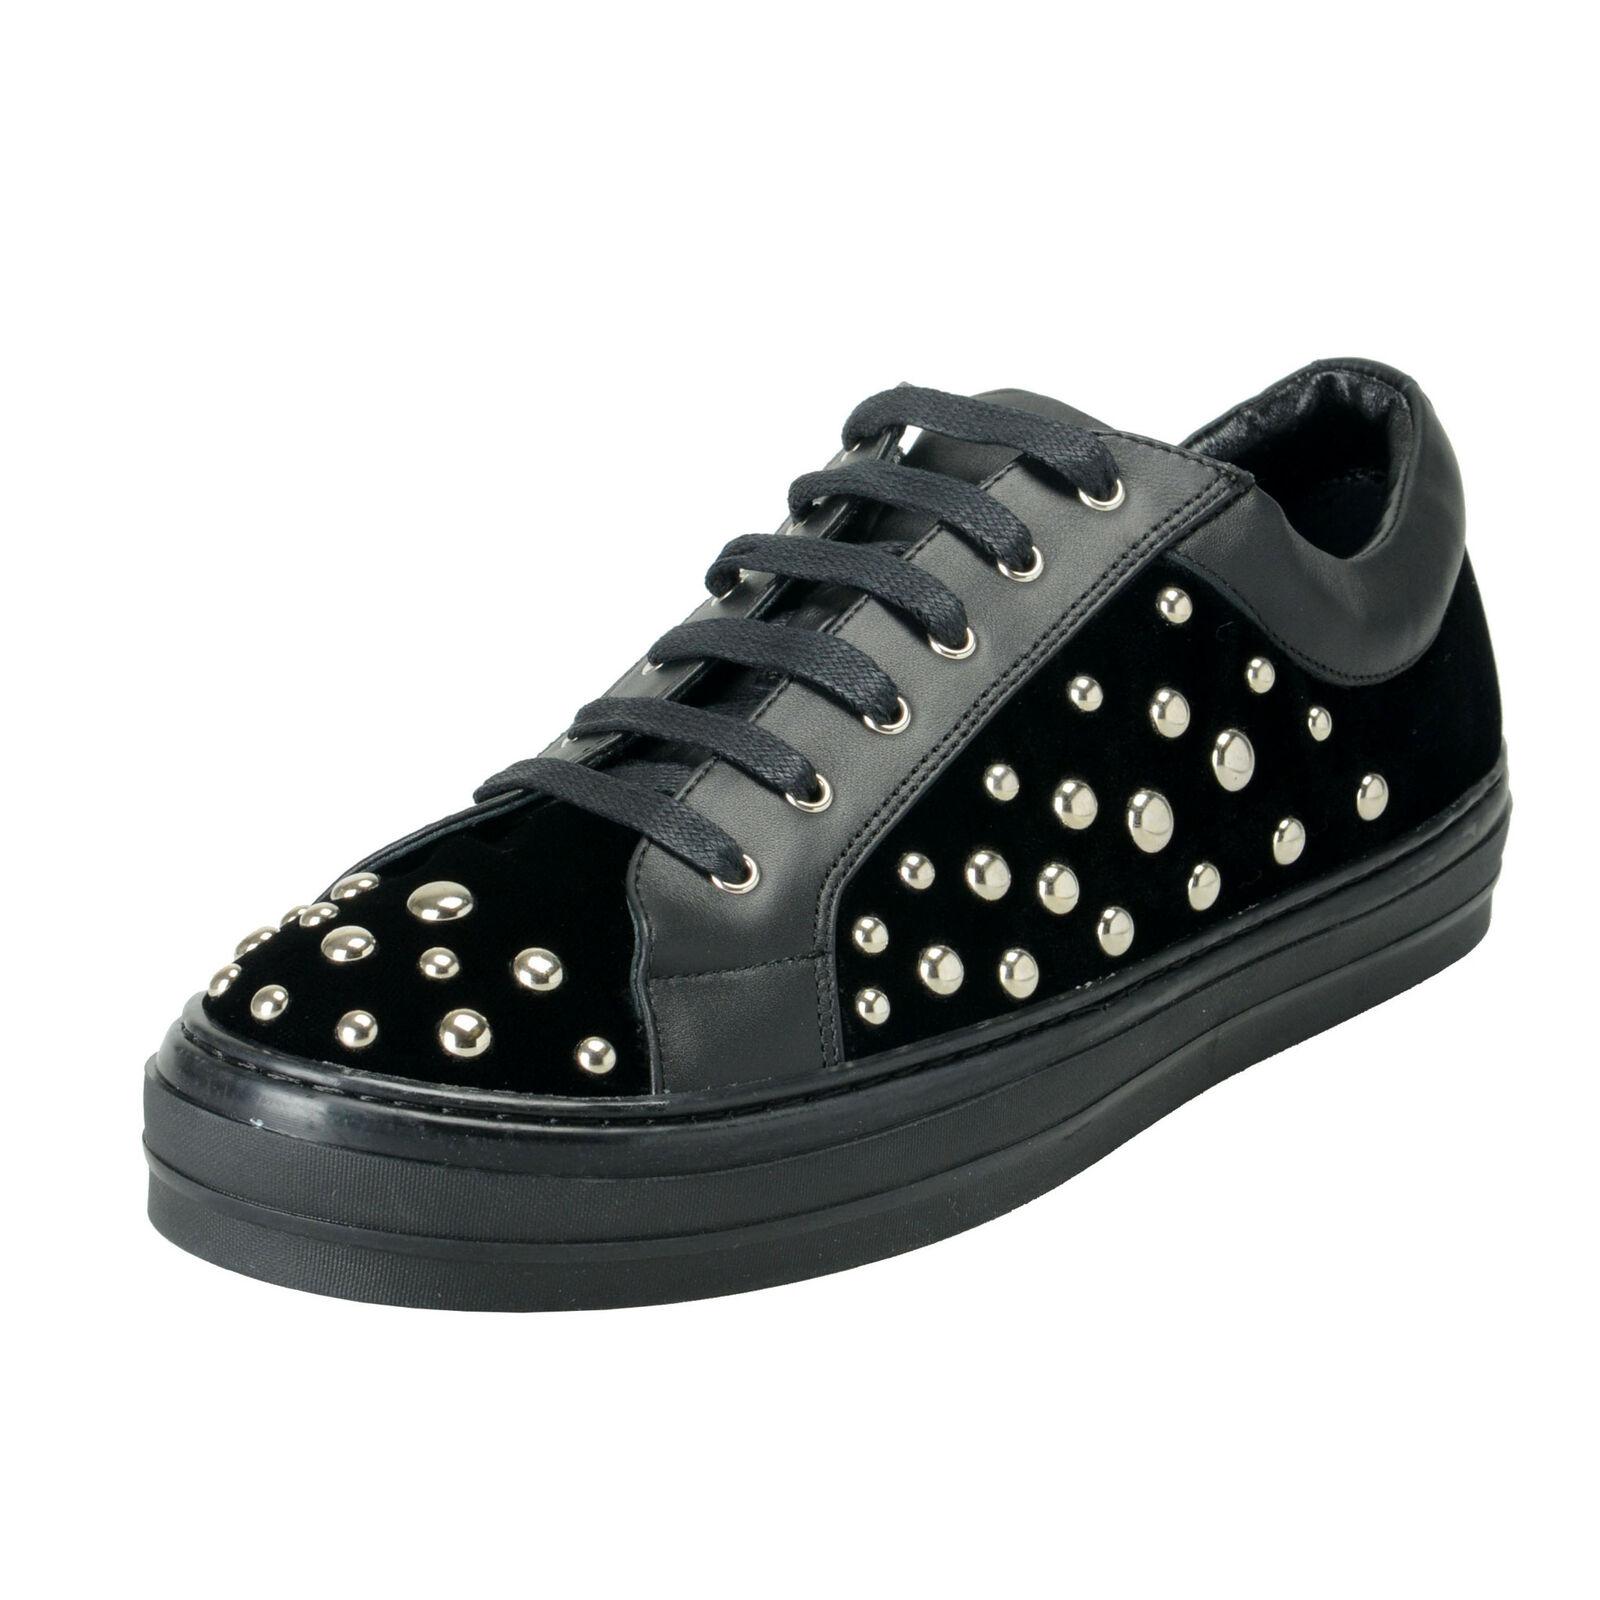 Salvatore Ferragamo Women's  LIU ROCK  Fashion Sneakers shoes Sz 8.5 9 9.5M